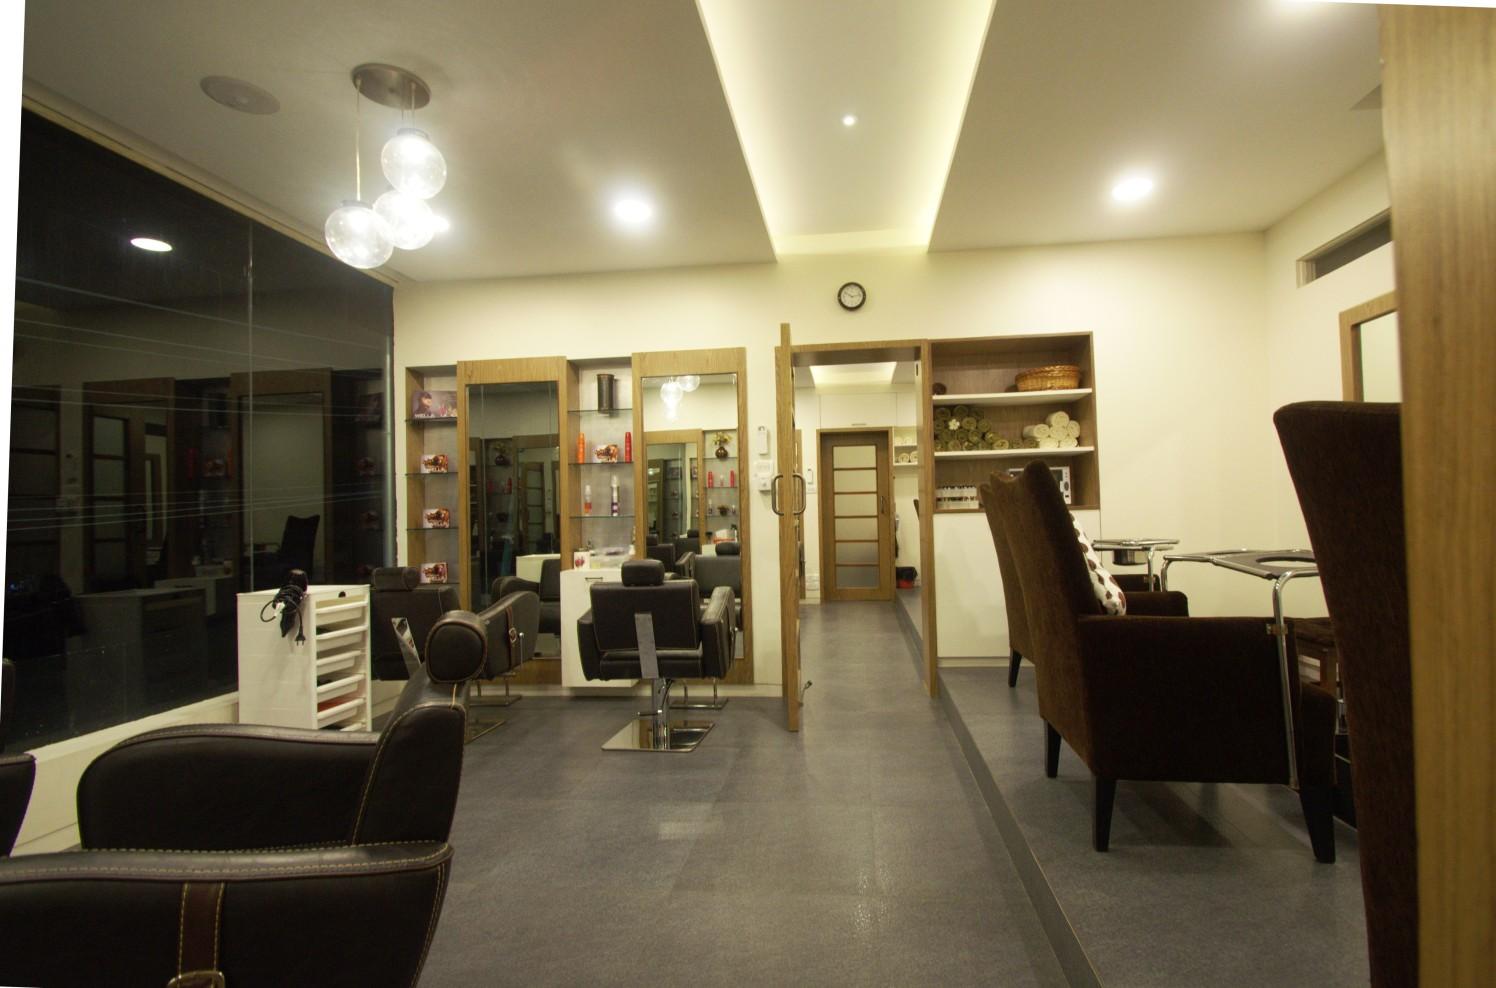 Spa and Salon by inspace design Contemporary | Interior Design Photos & Ideas